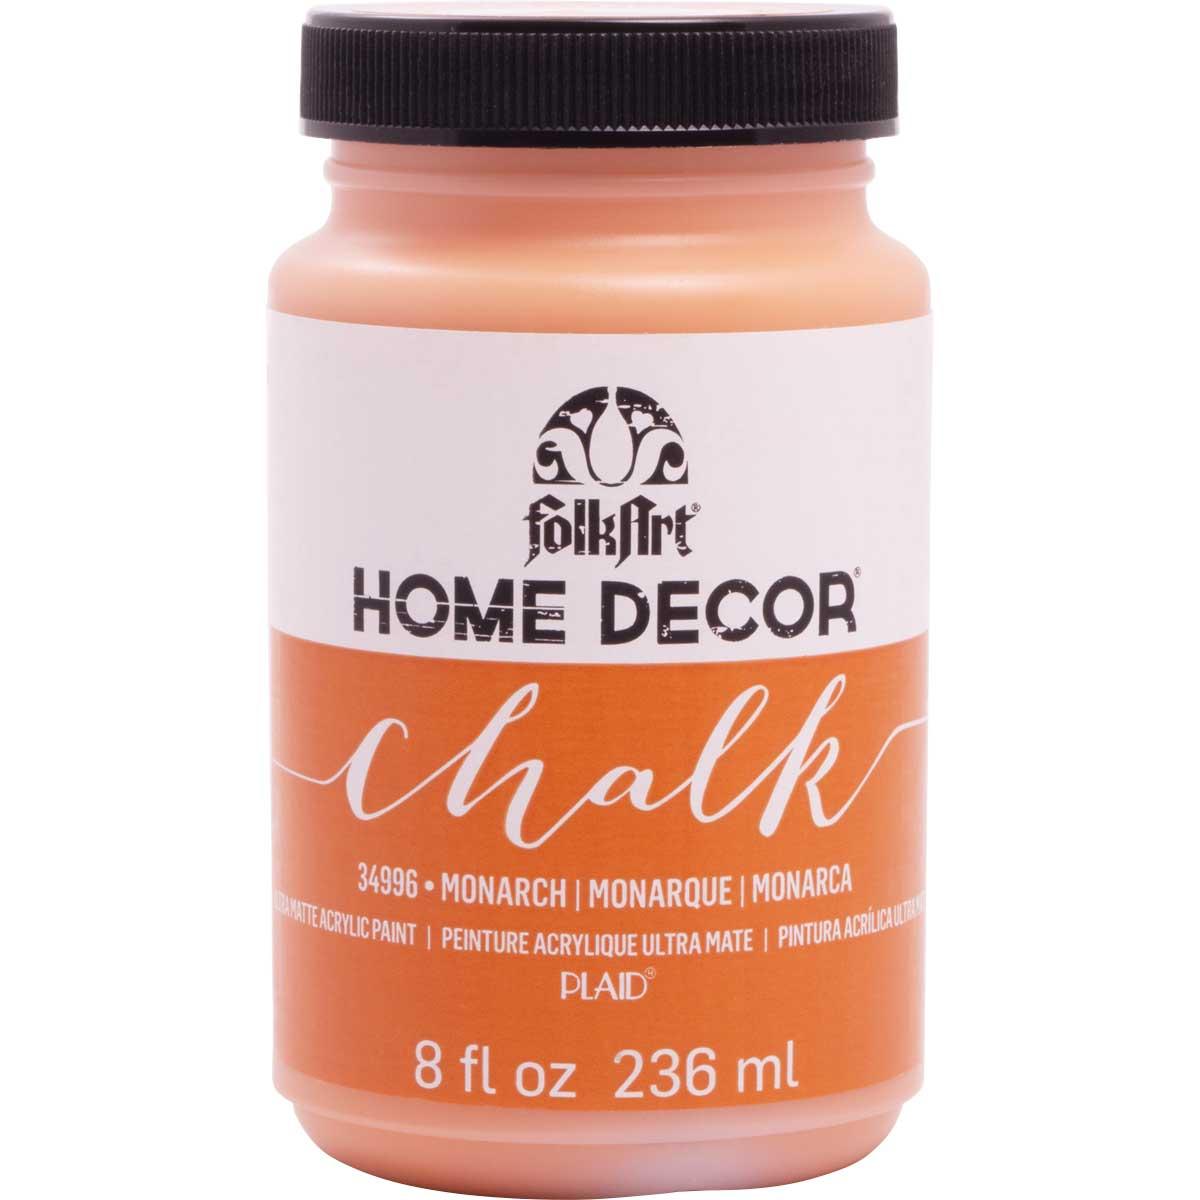 FolkArt ® Home Decor™ Chalk - Monarch, 8 oz.